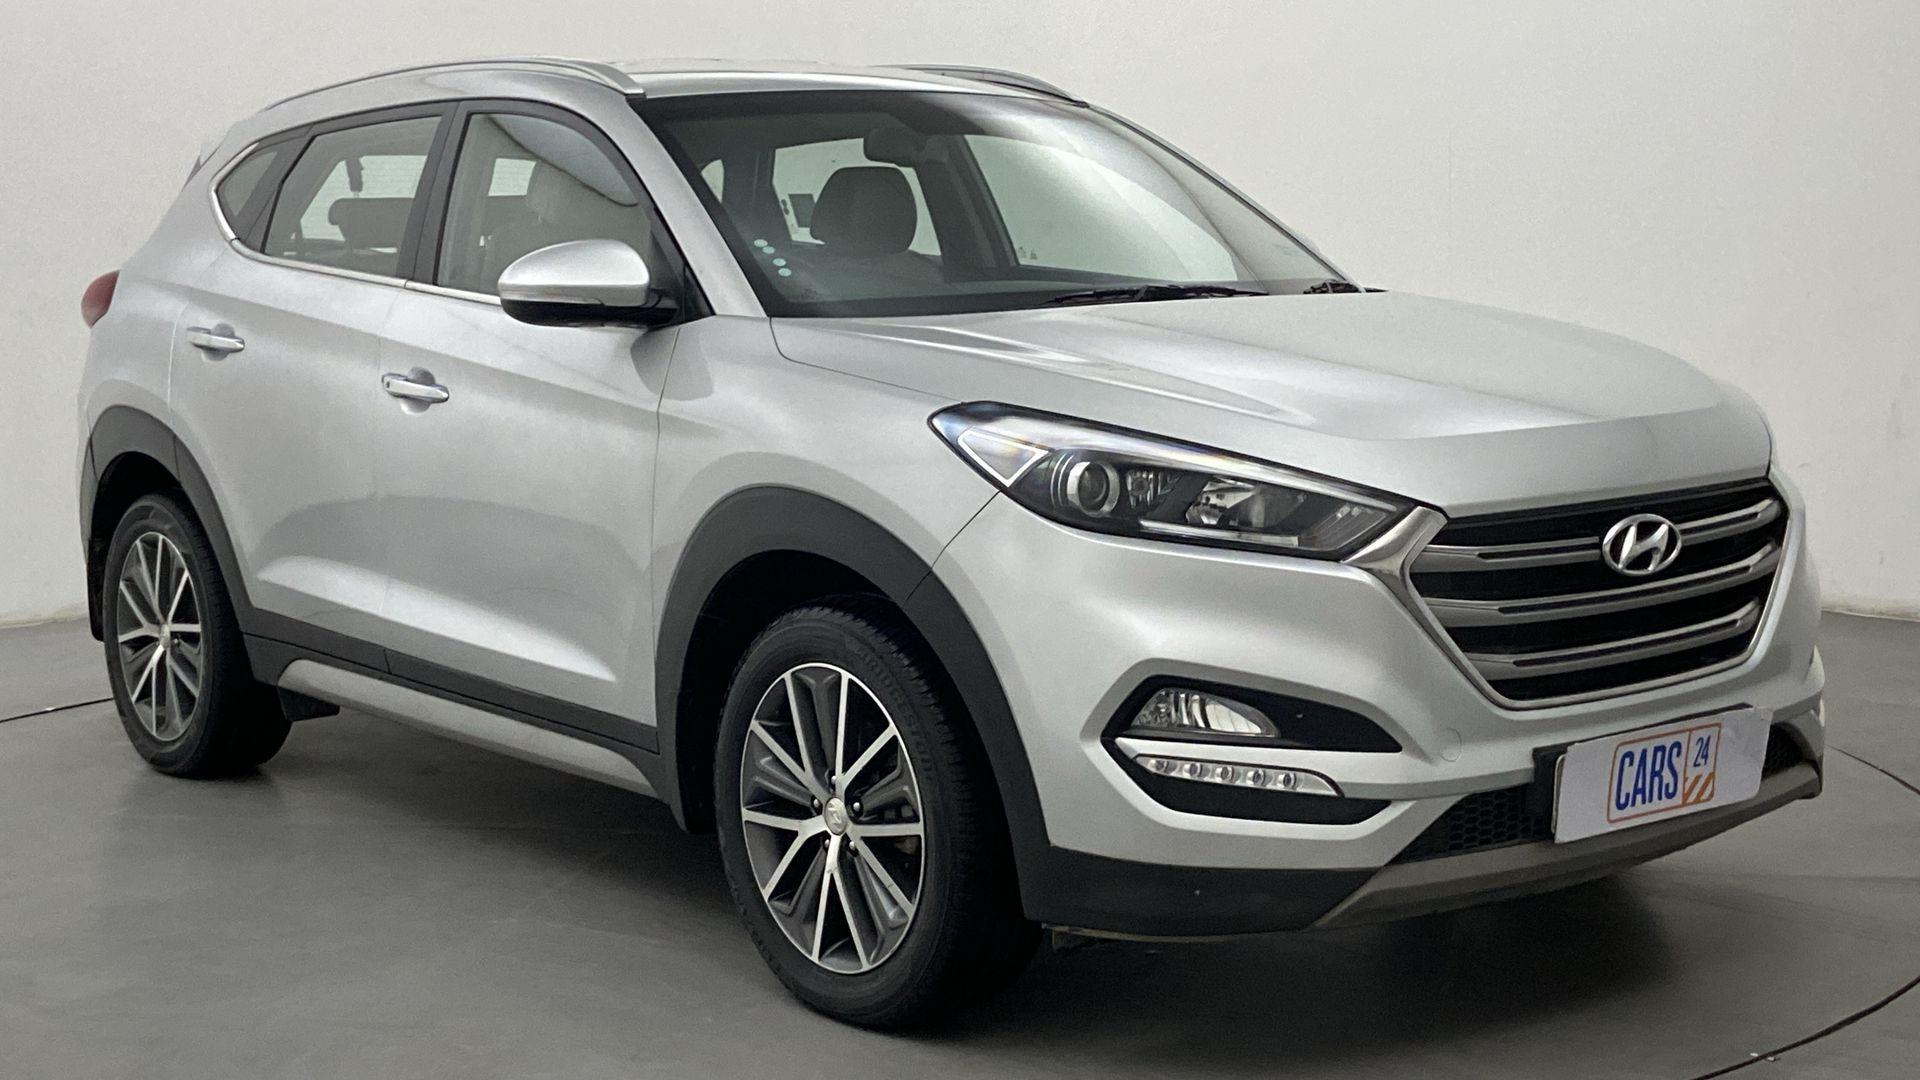 2018 Hyundai Tucson New 2WD AT GL DIESEL